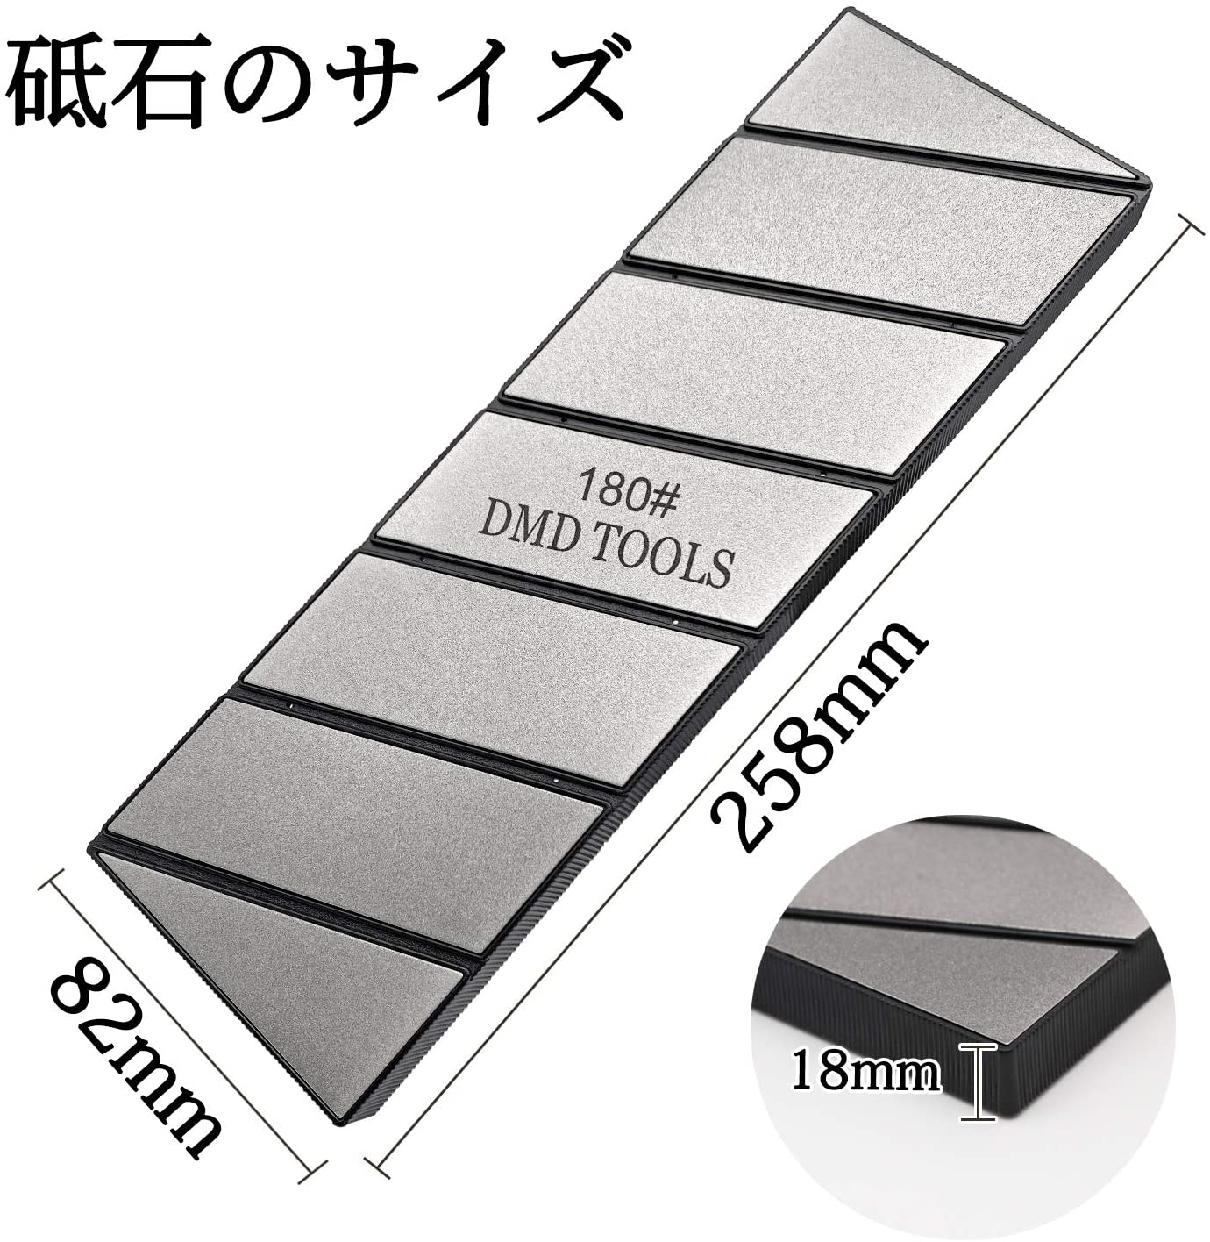 GOKEI 面直し用砥石 単面タイプ #180 258×82×18mmの商品画像6